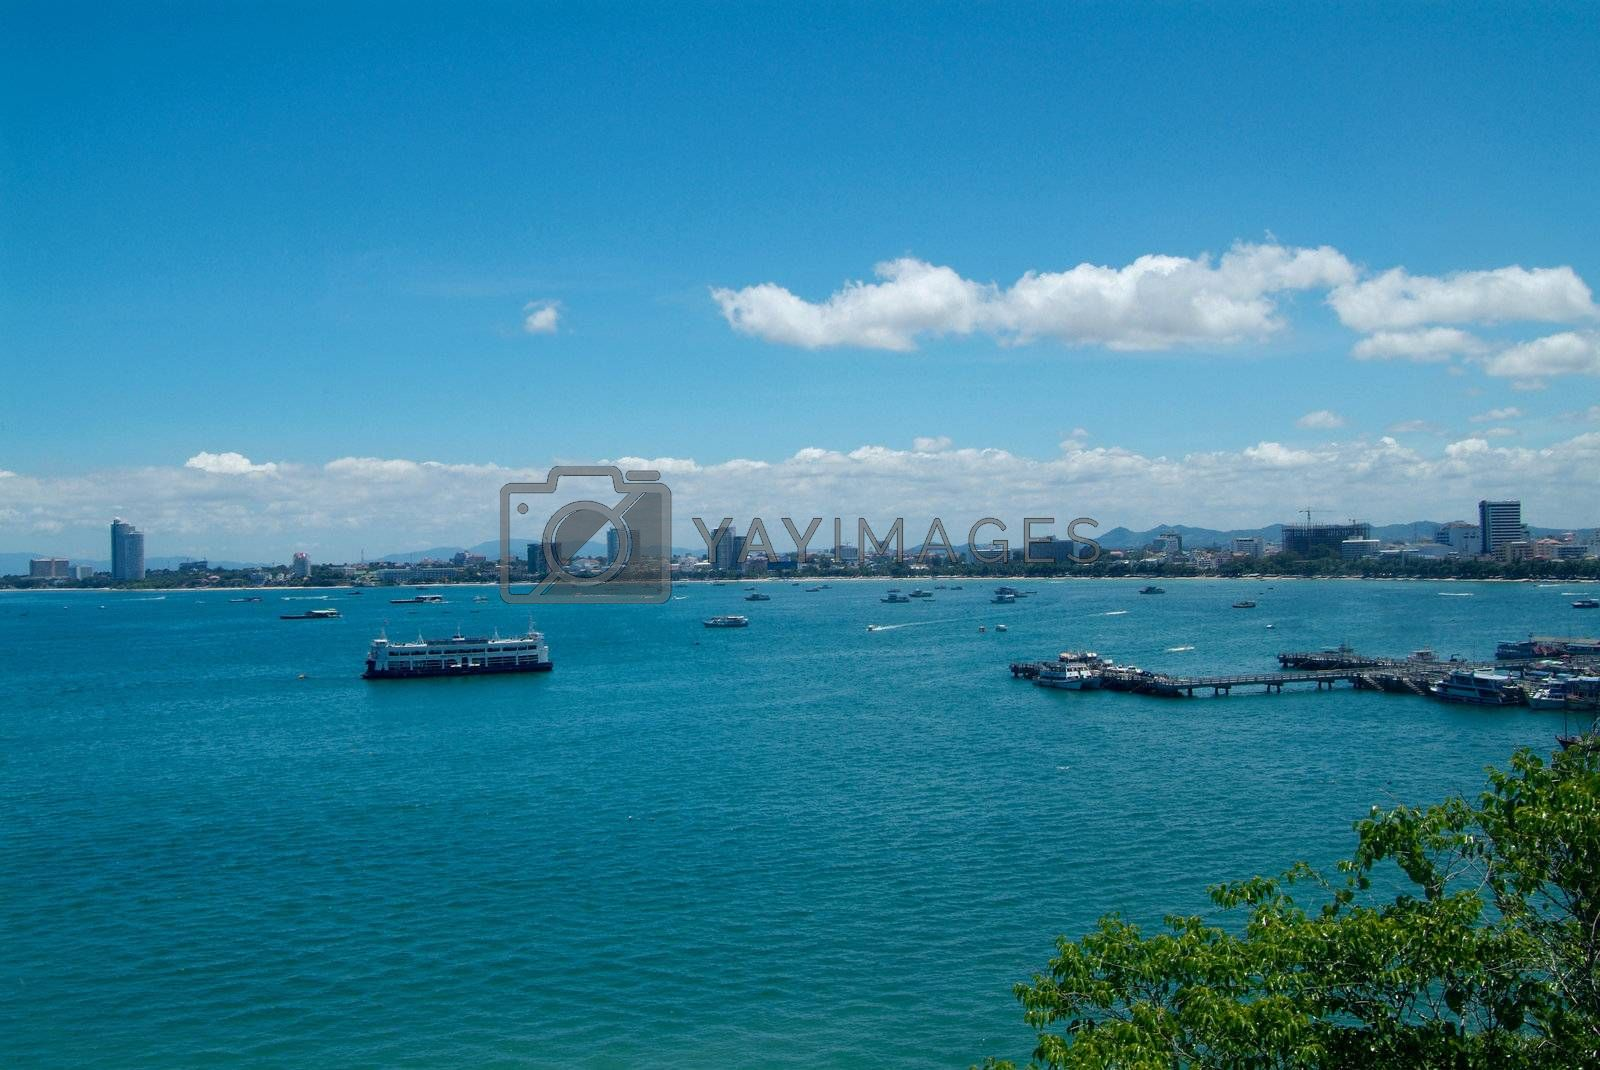 Royalty free image of Pattaya skyline by epixx